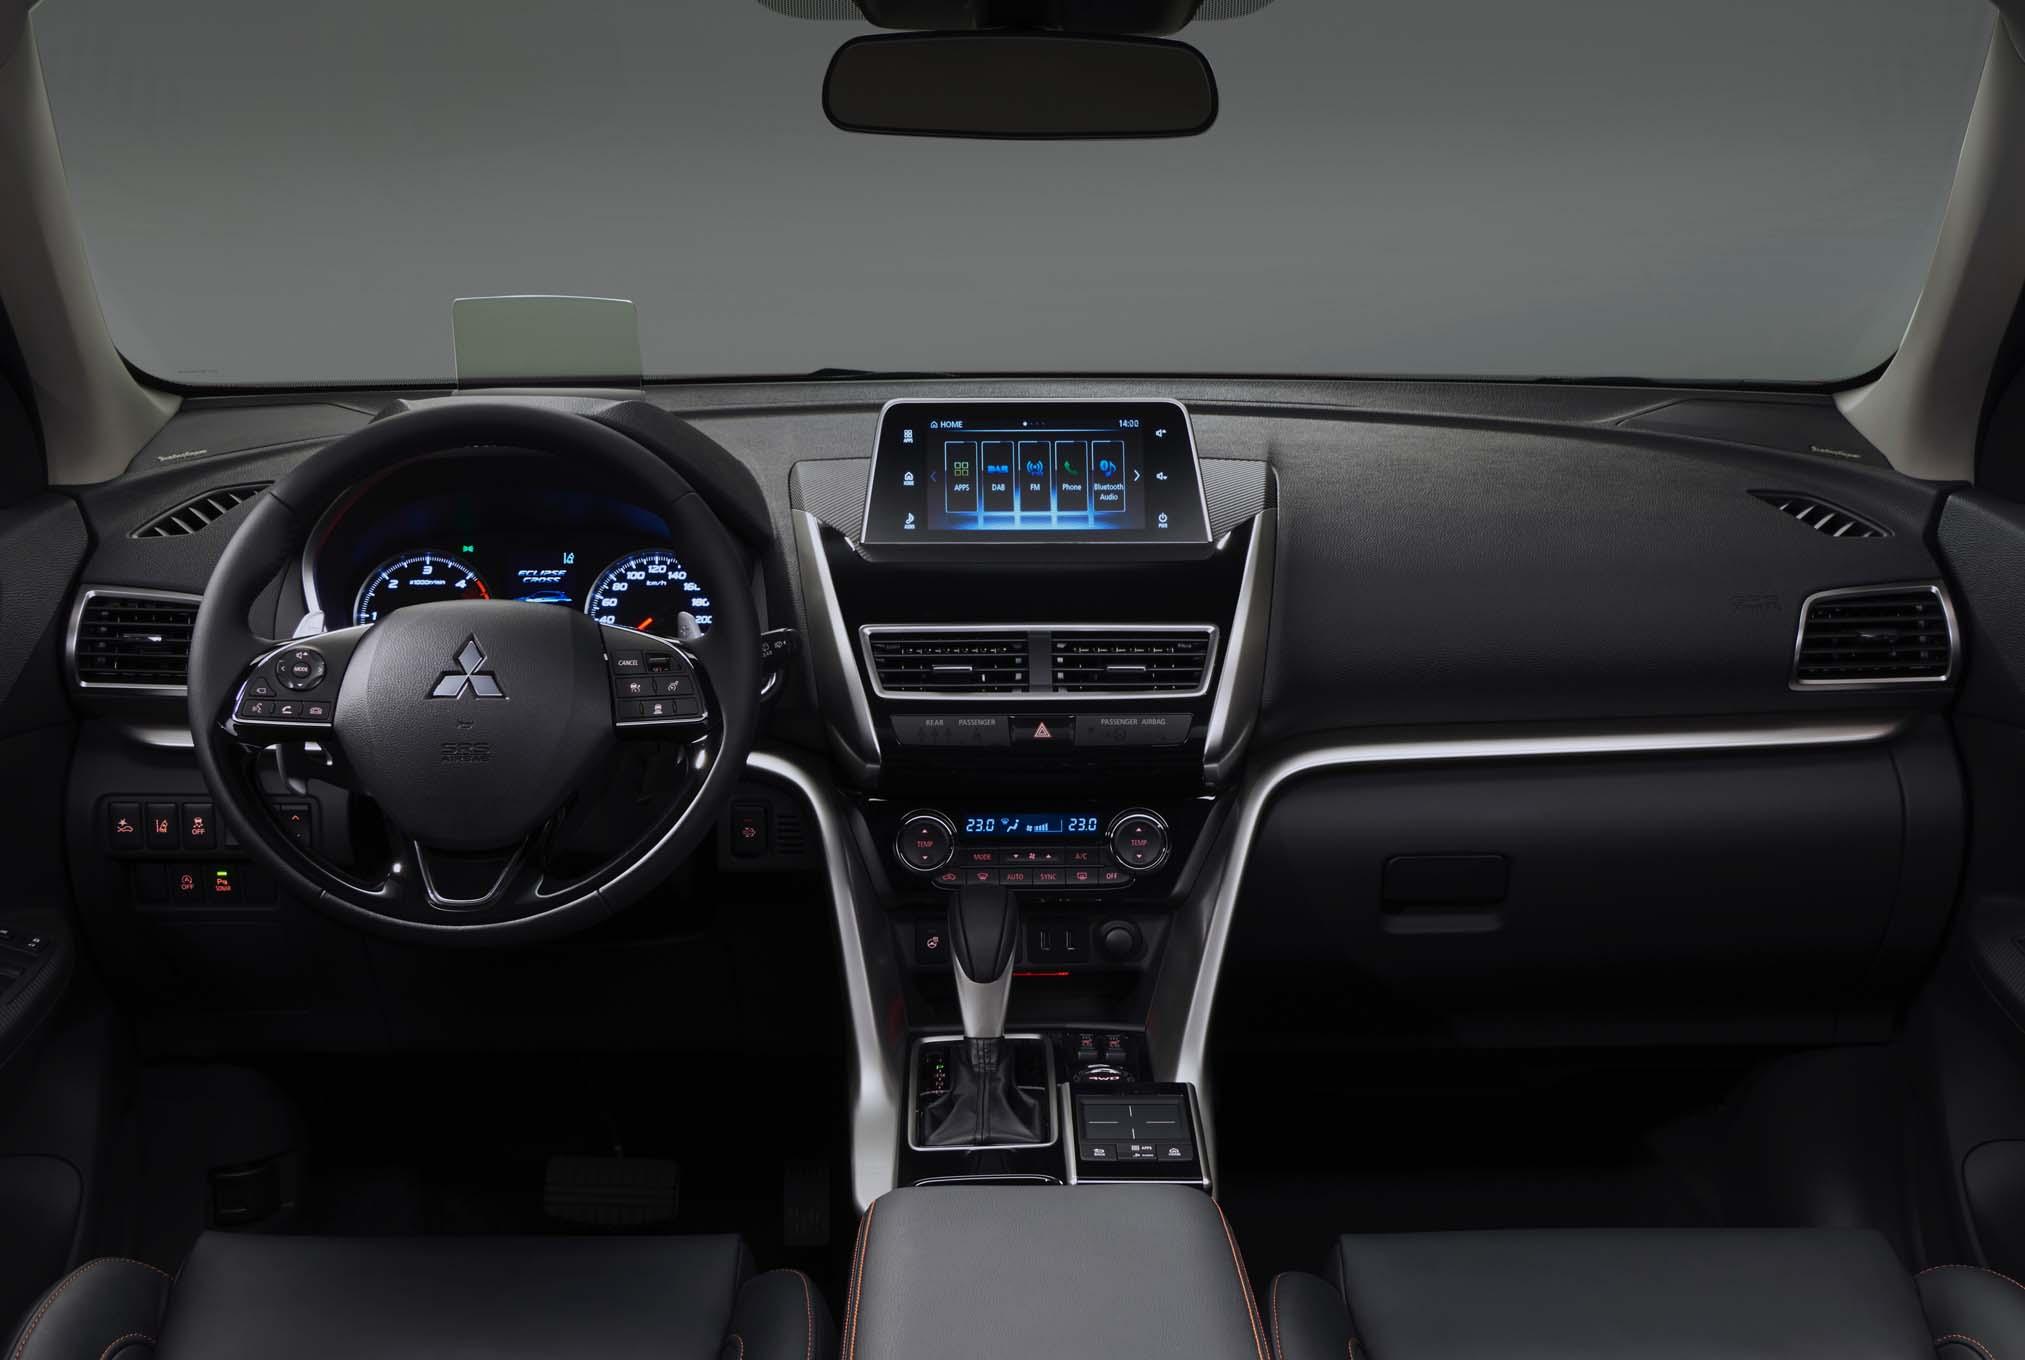 2018 Mitsubishi Eclipse Cross Interior View 1